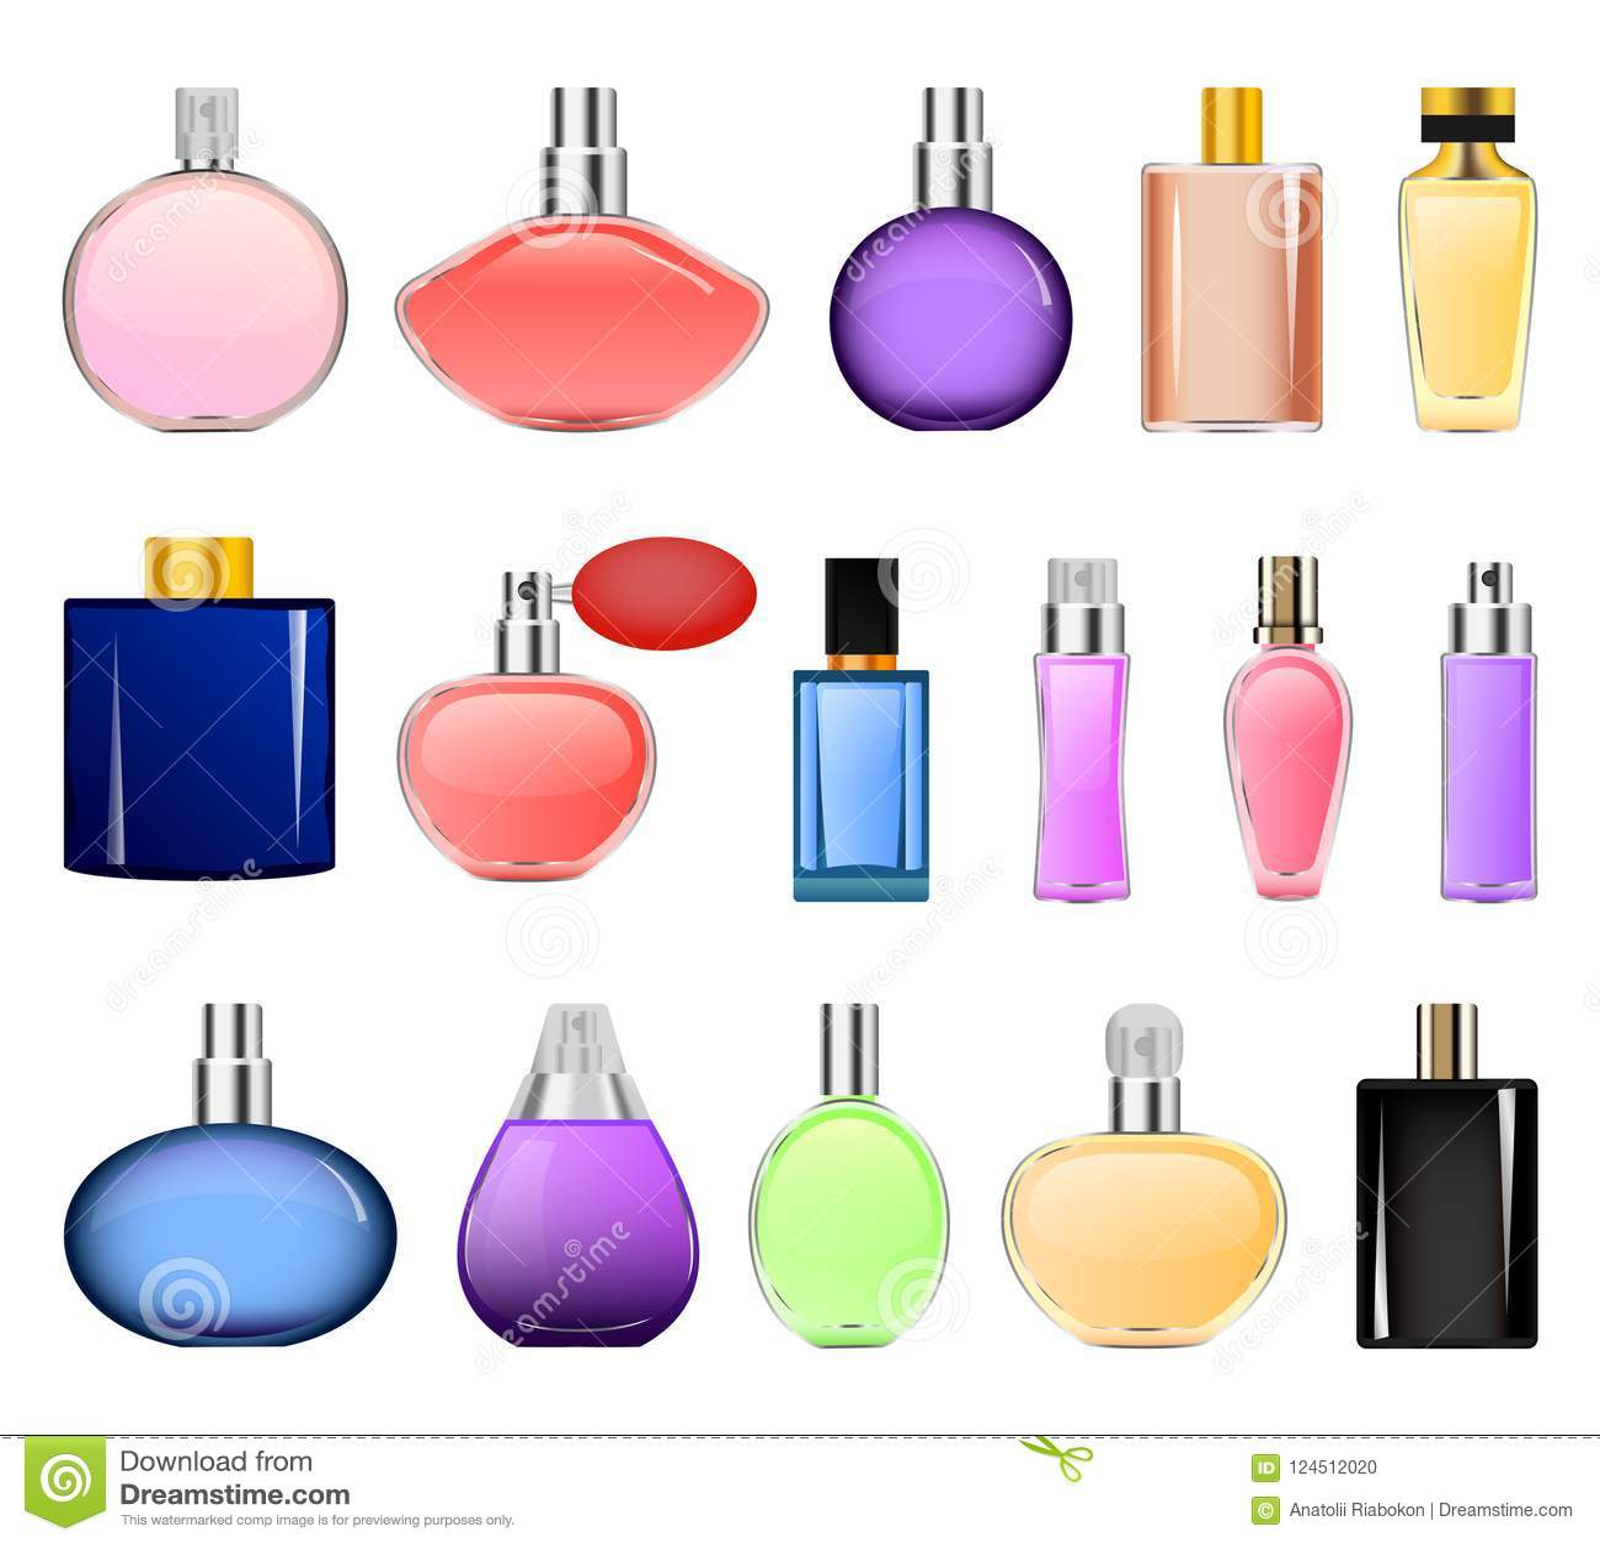 Fragrance bottles mockup set, realistic style